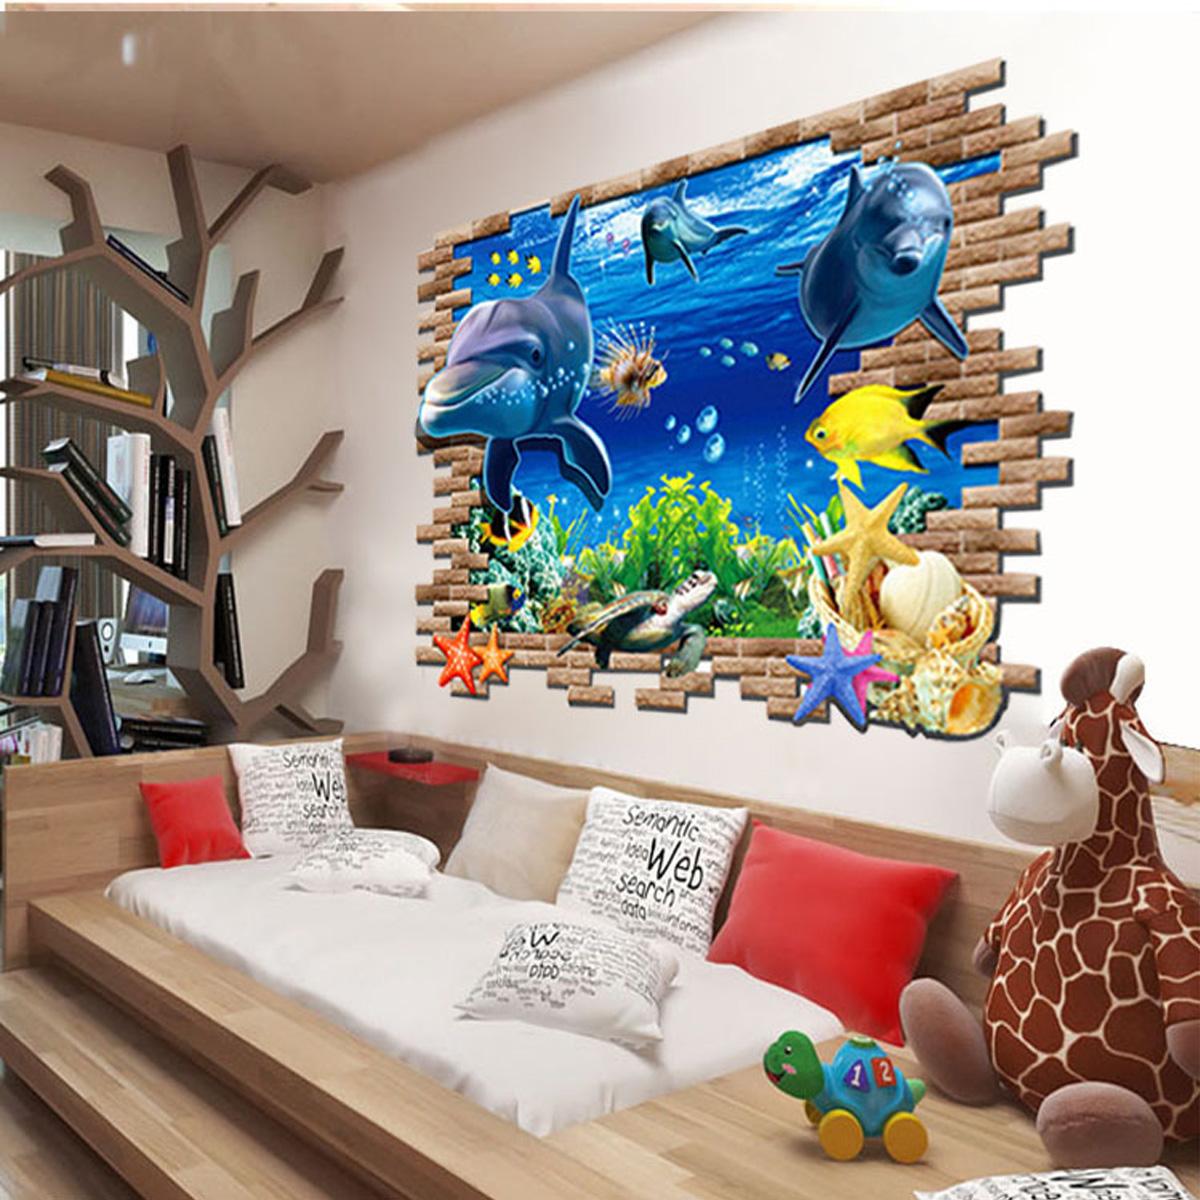 Wandtattoo fisch delfine ozean meer wanddekoration vinyl aufkleber ...